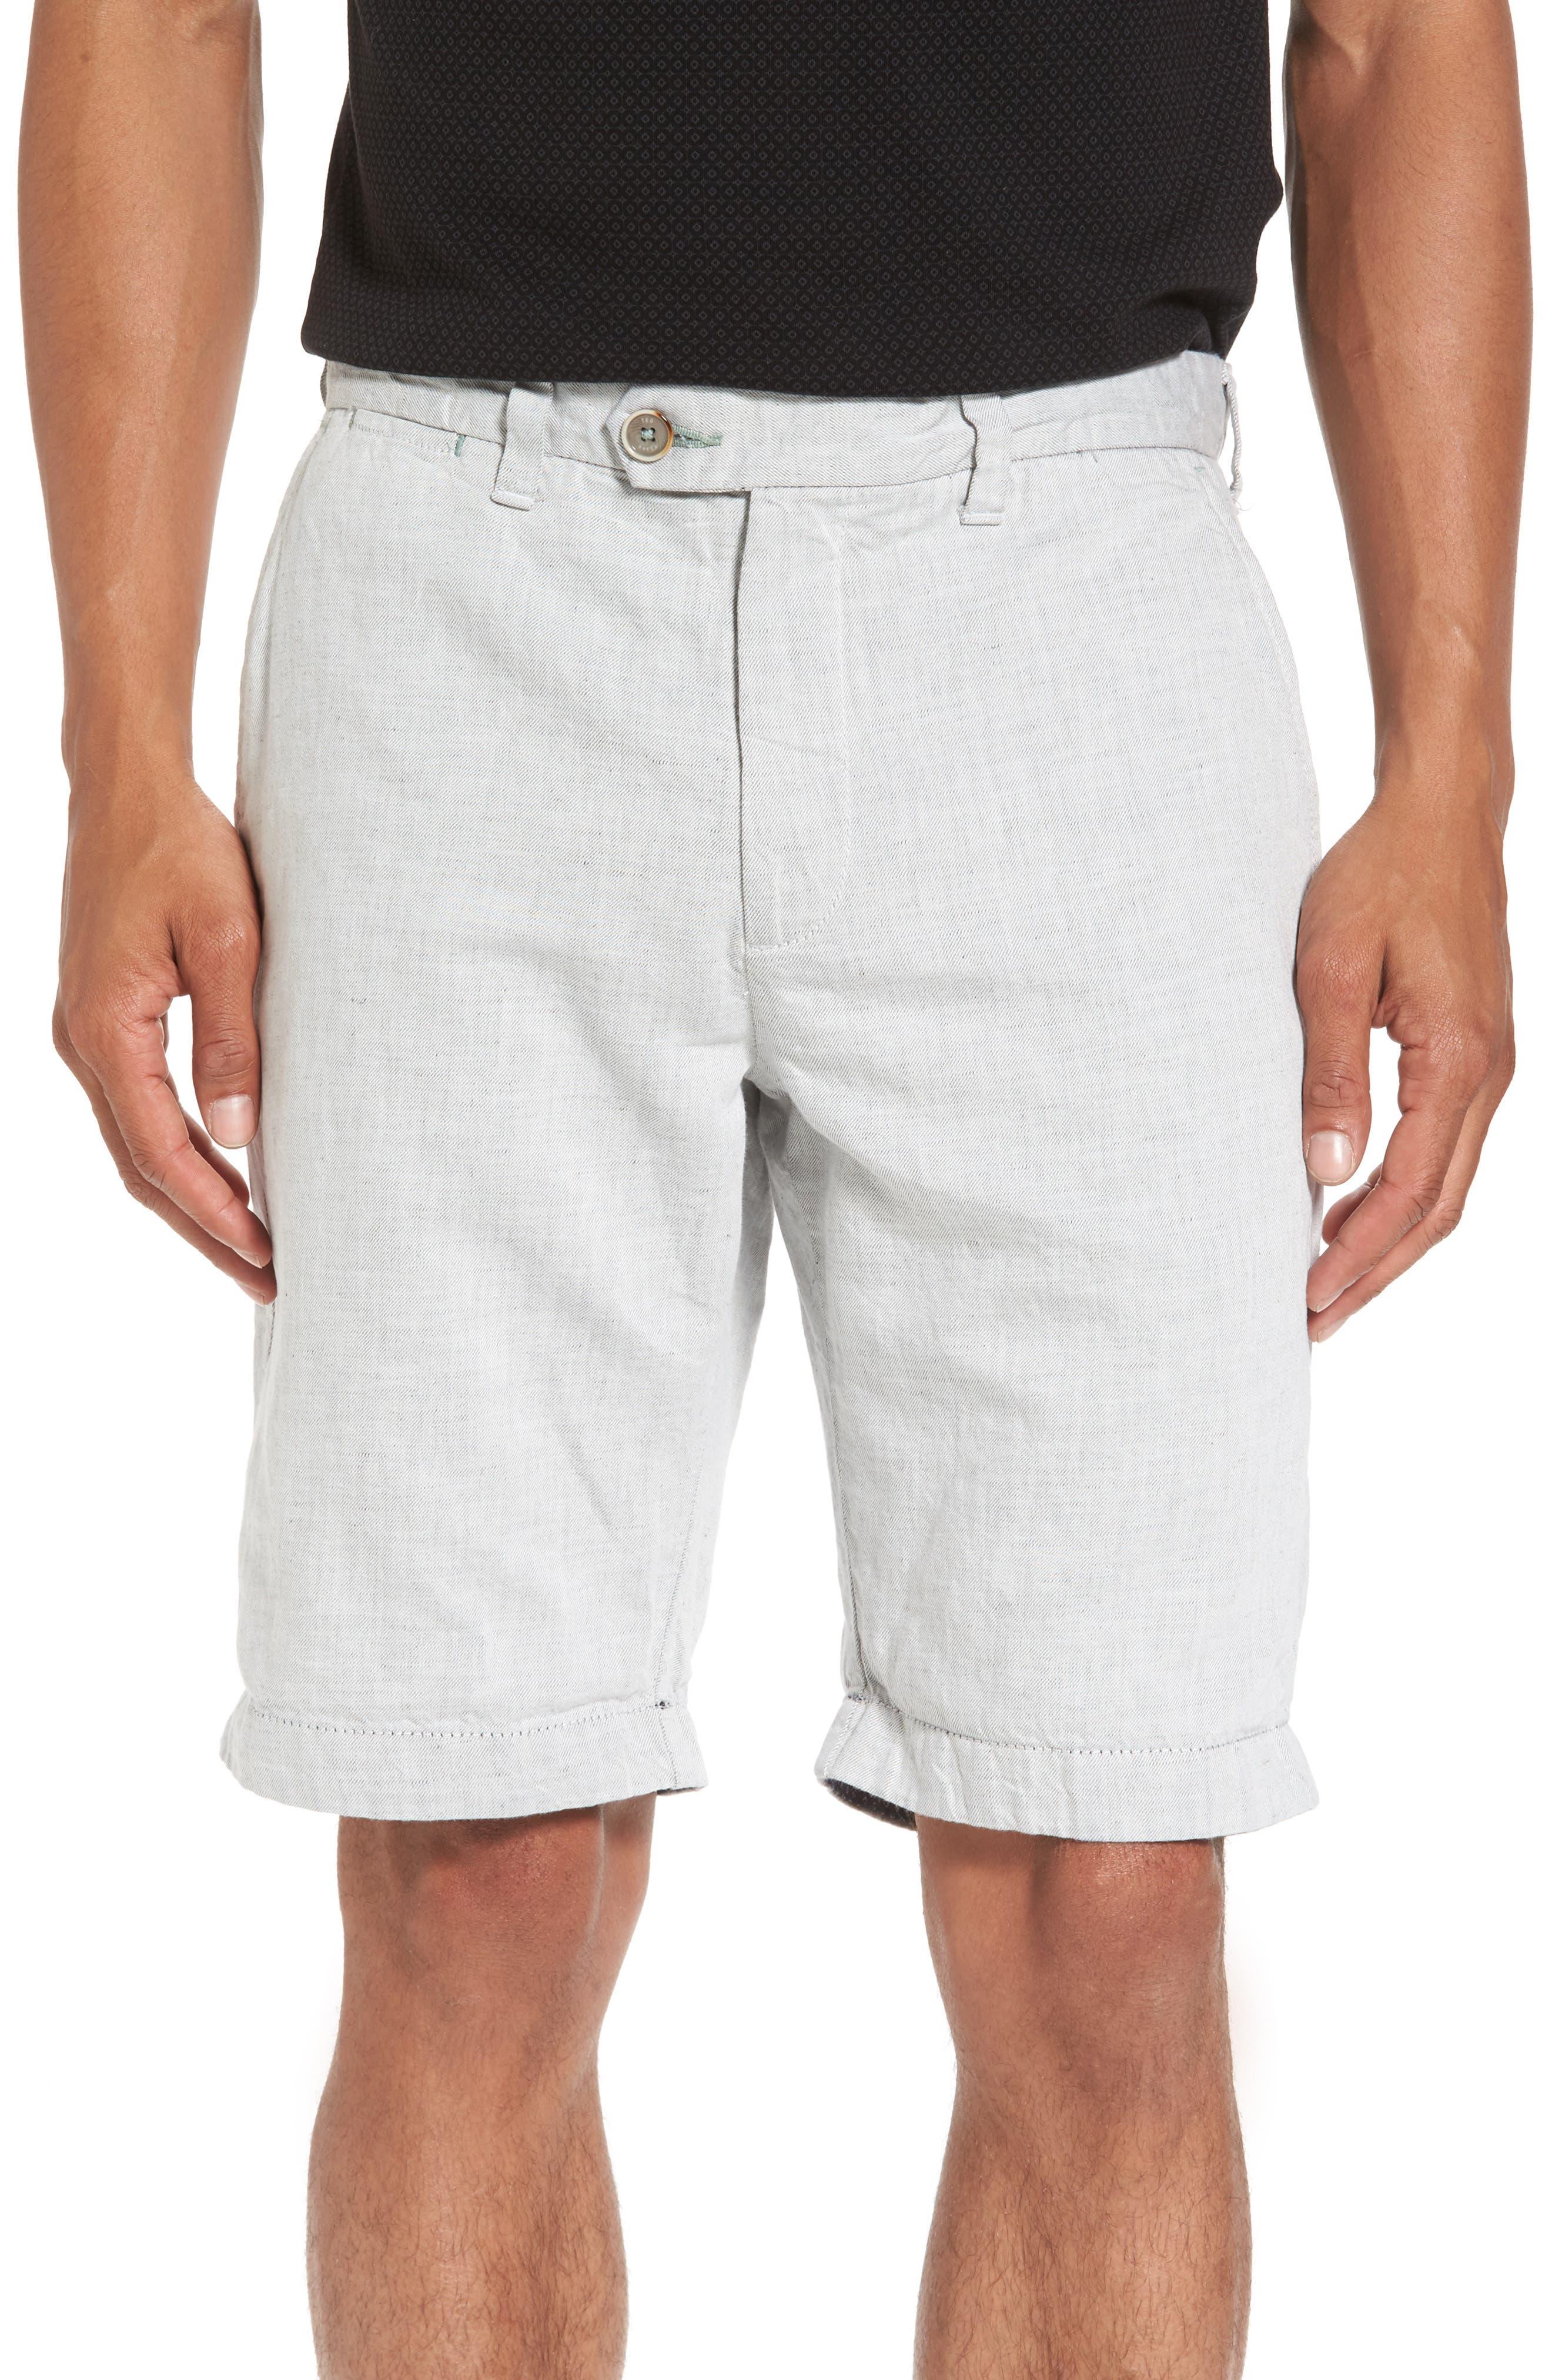 Frisho Cuff Denim Shorts,                         Main,                         color, Light Grey